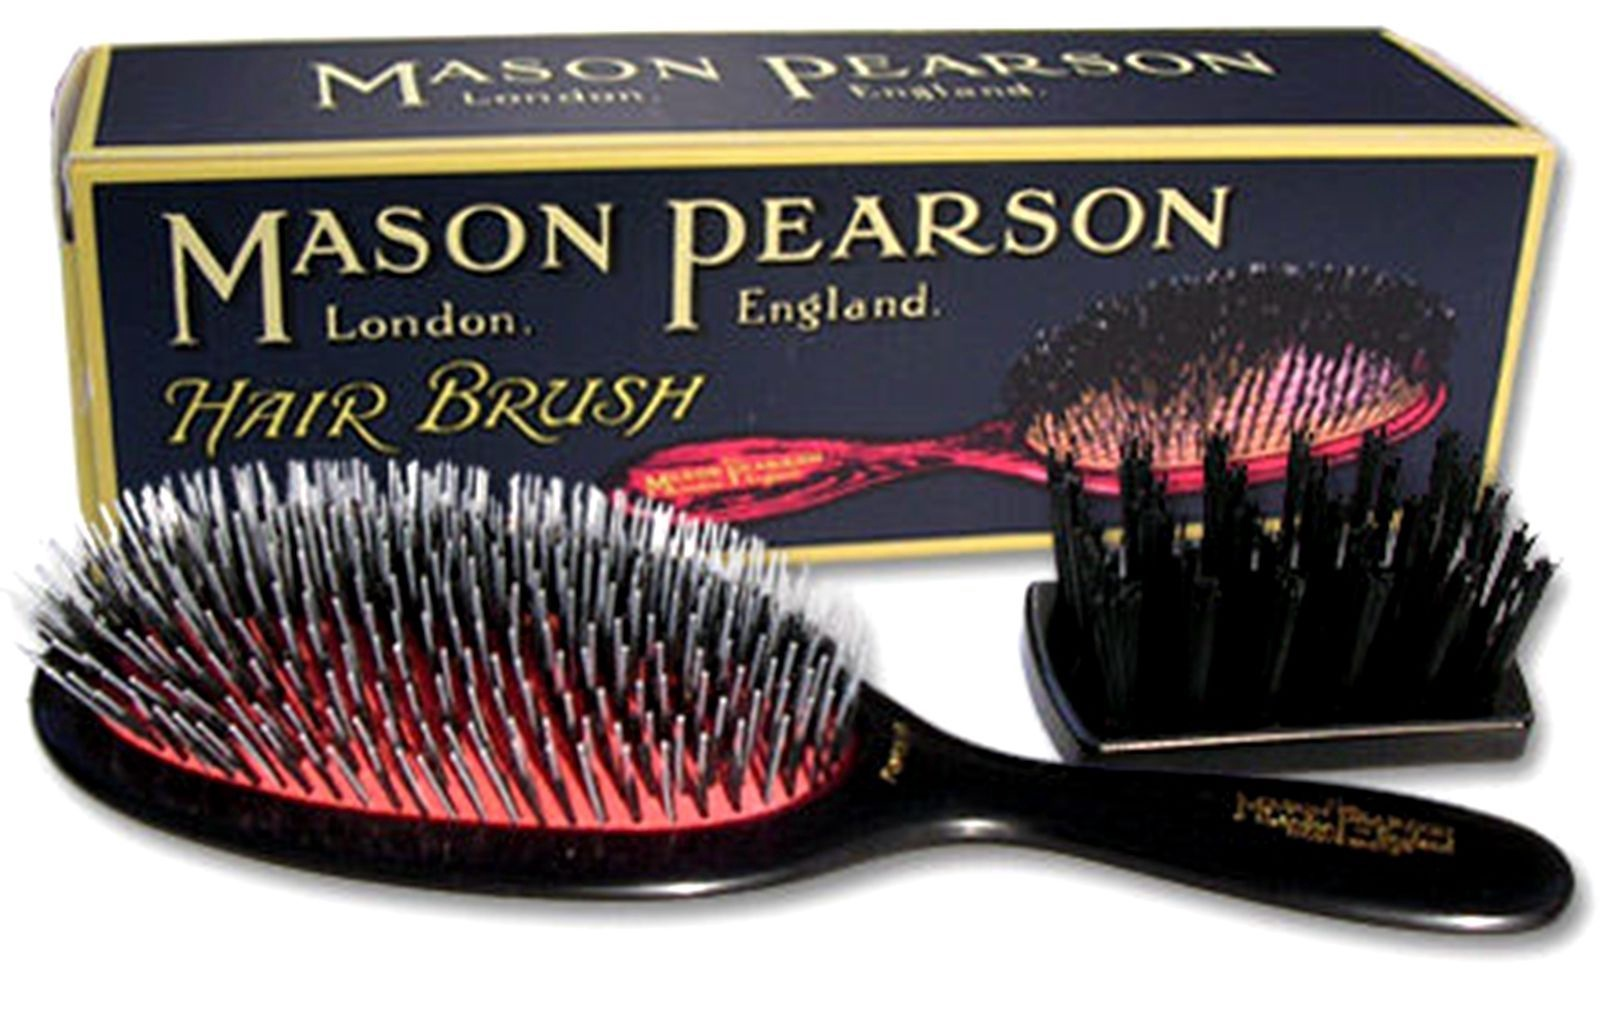 Mason Pearson popular nylon & bristle Brush